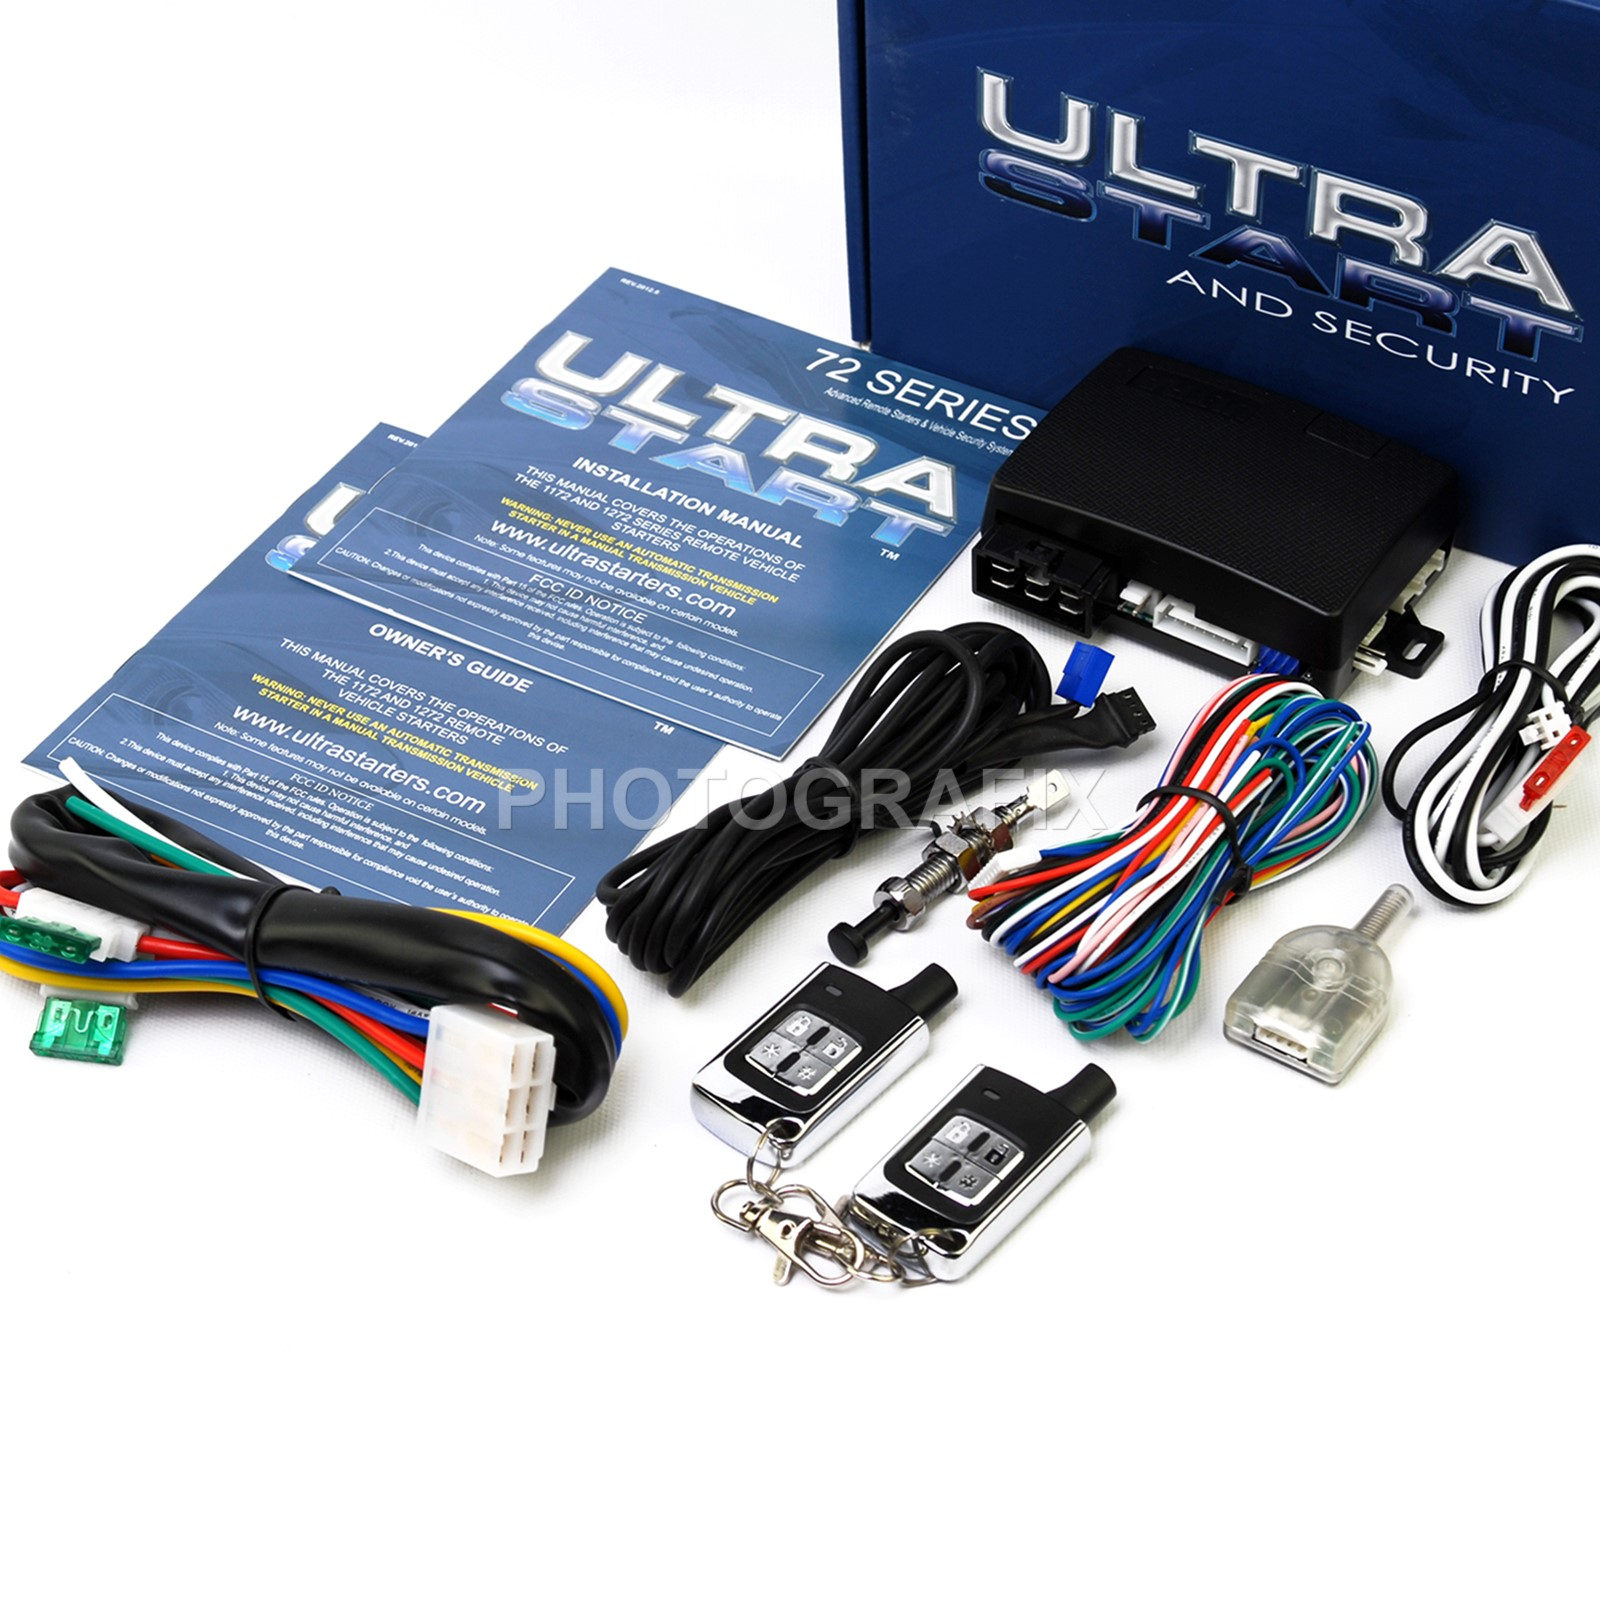 ultra remote car starter wiring diagram 2001 chevy silverado 1500 radio start 1272 xr pro keyless auto